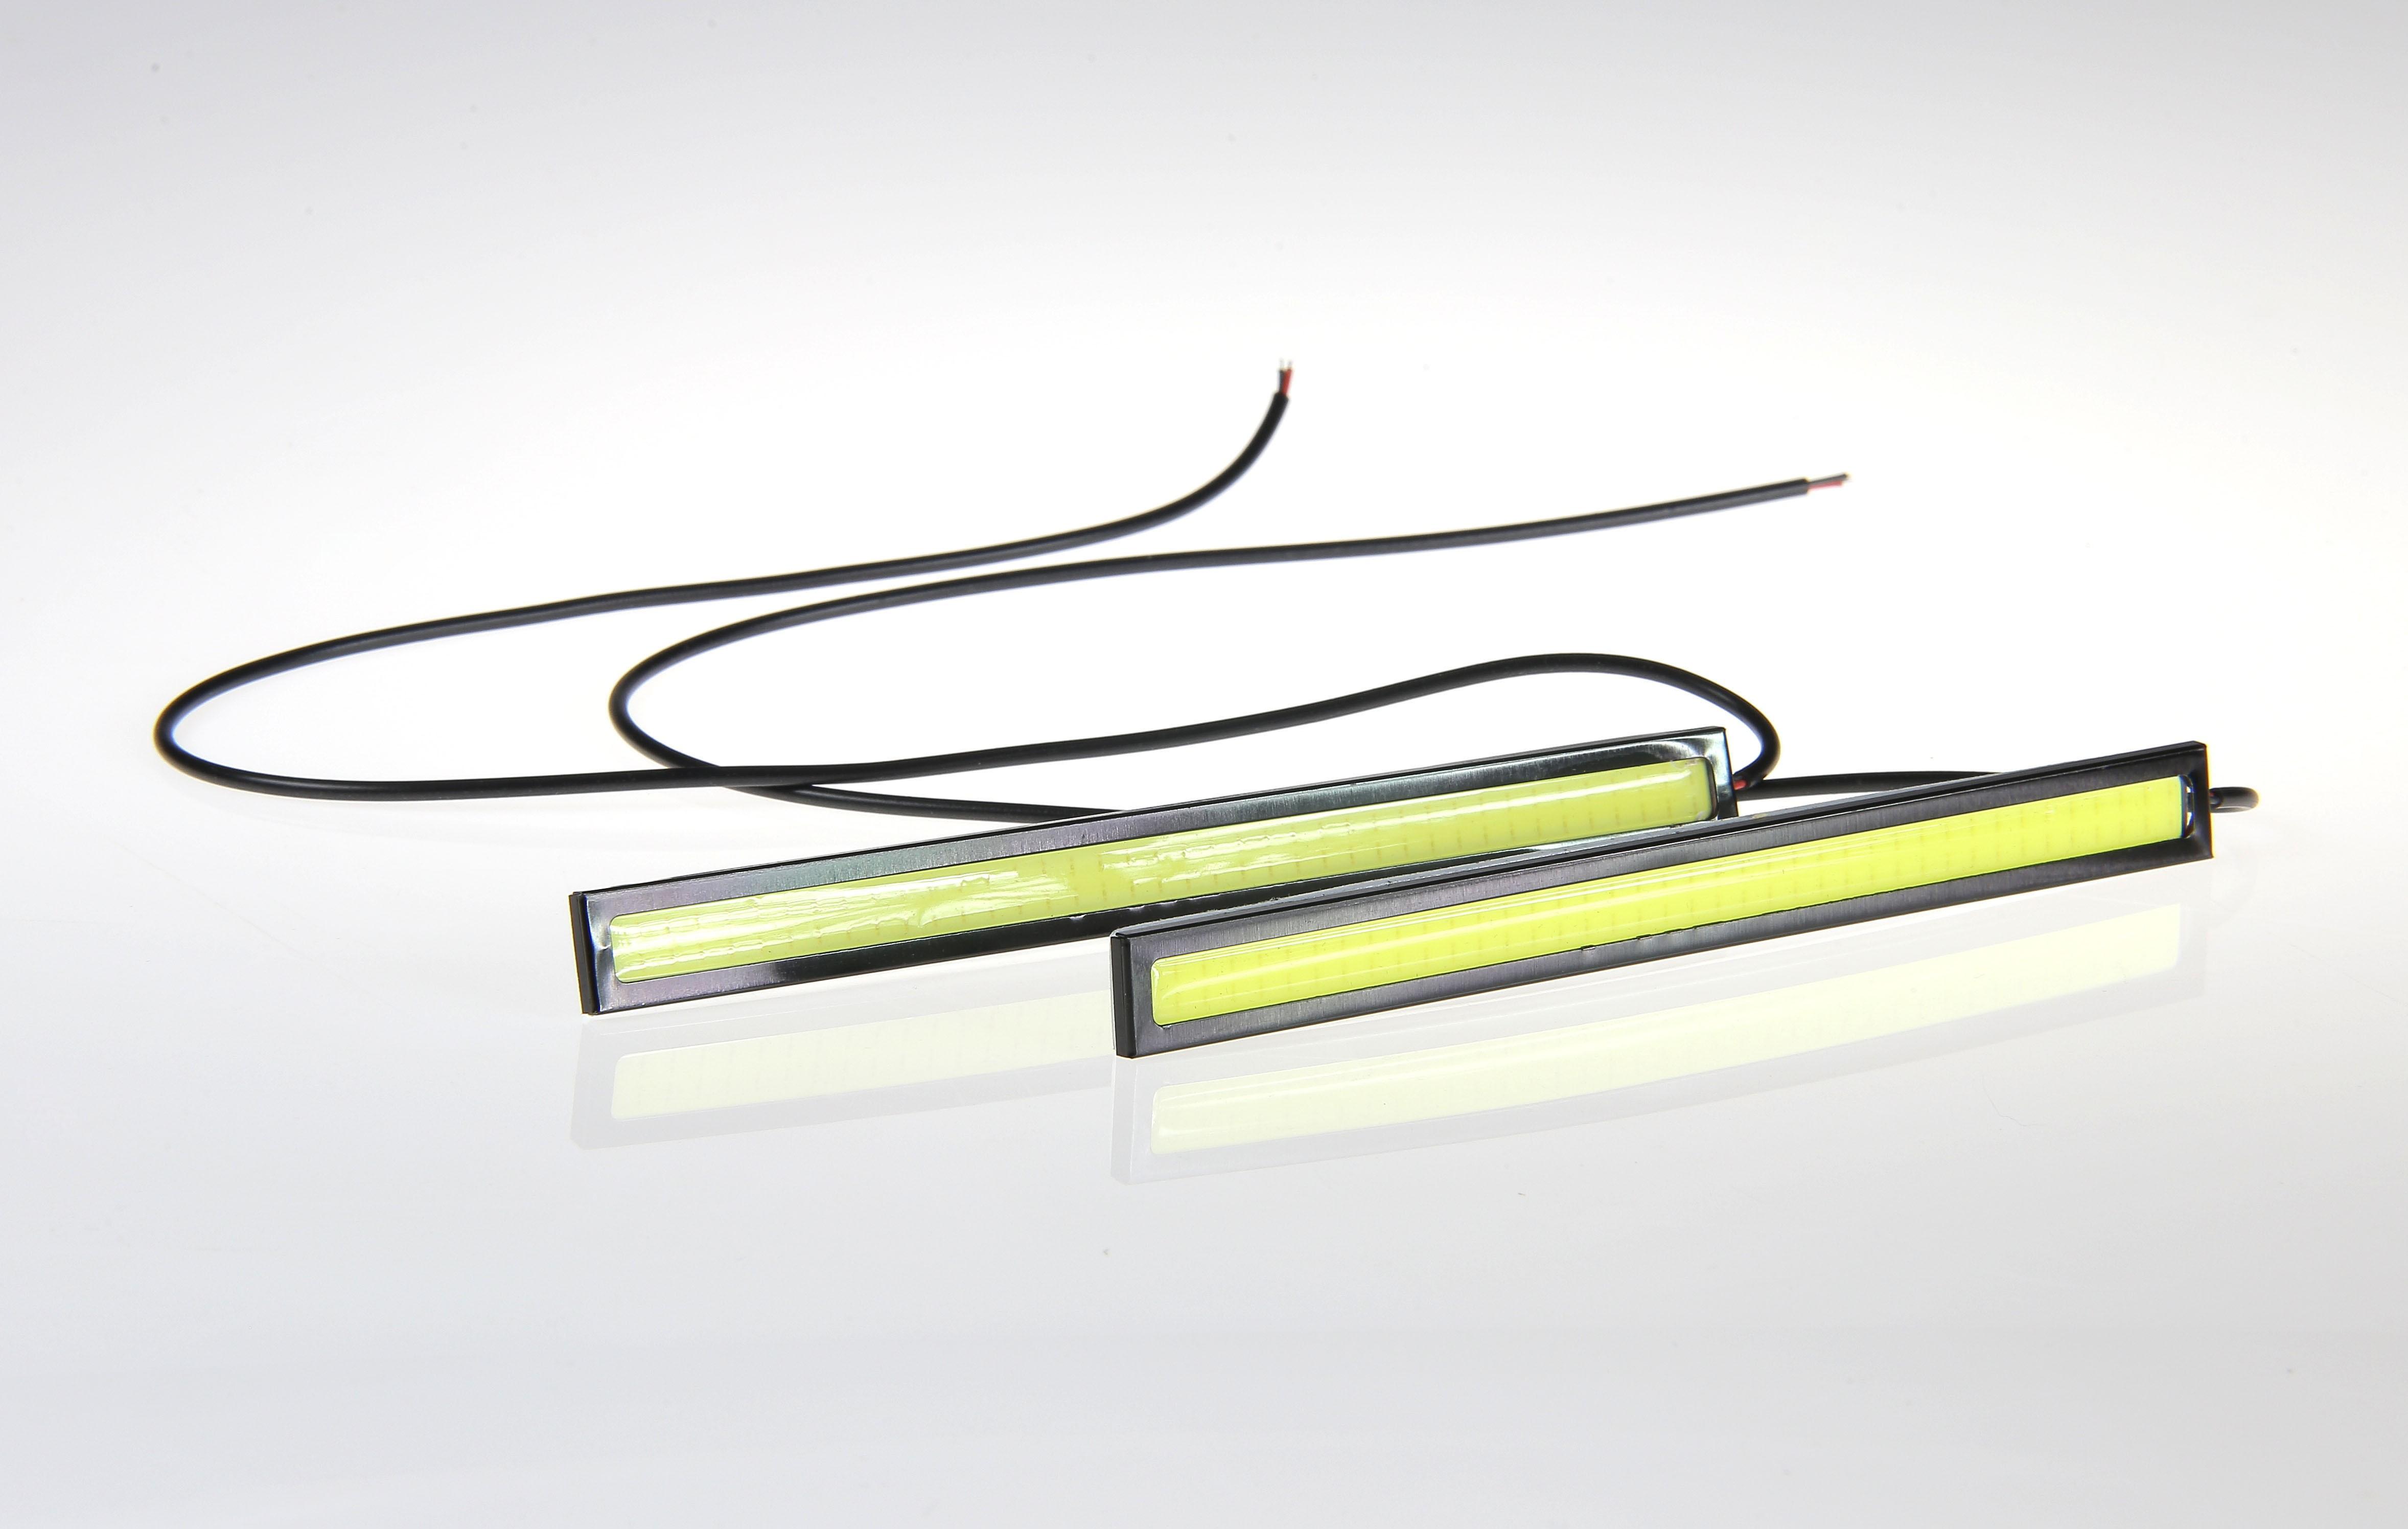 Panel LED oświetlenia kabiny/wnętrza 24V